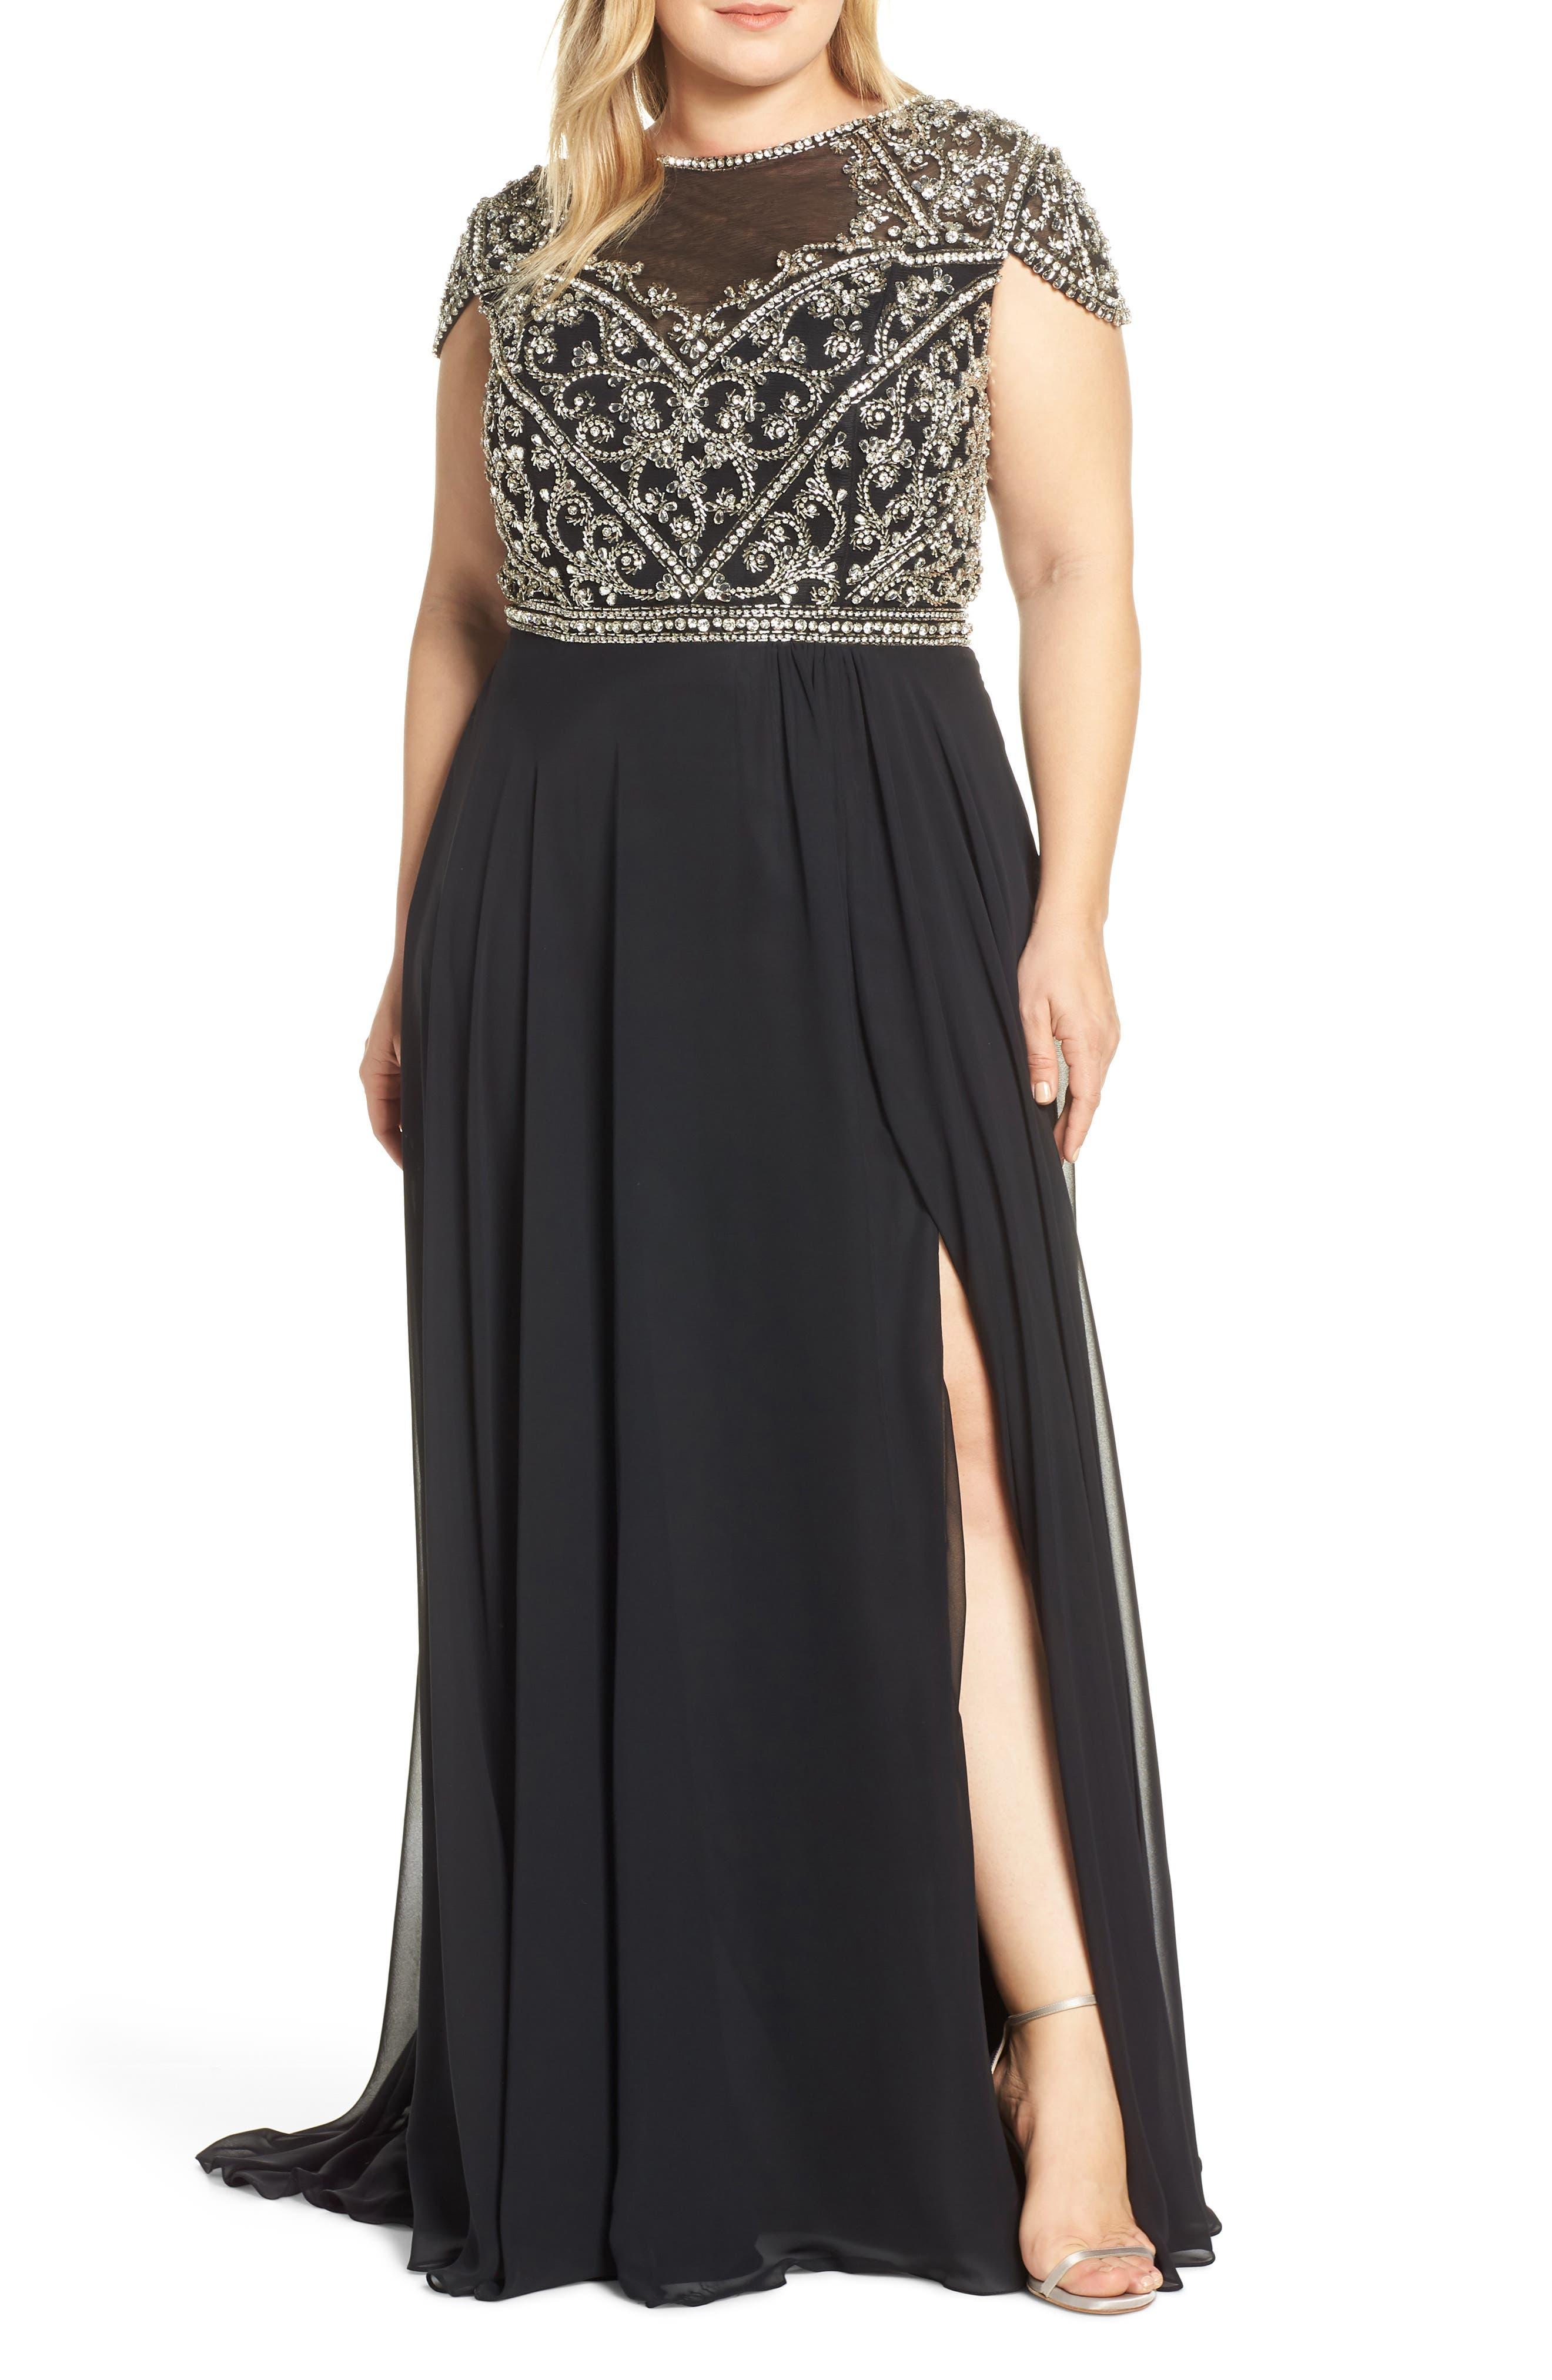 MAC DUGGAL, Embellished Bodice Evening Dress, Main thumbnail 1, color, BLACK